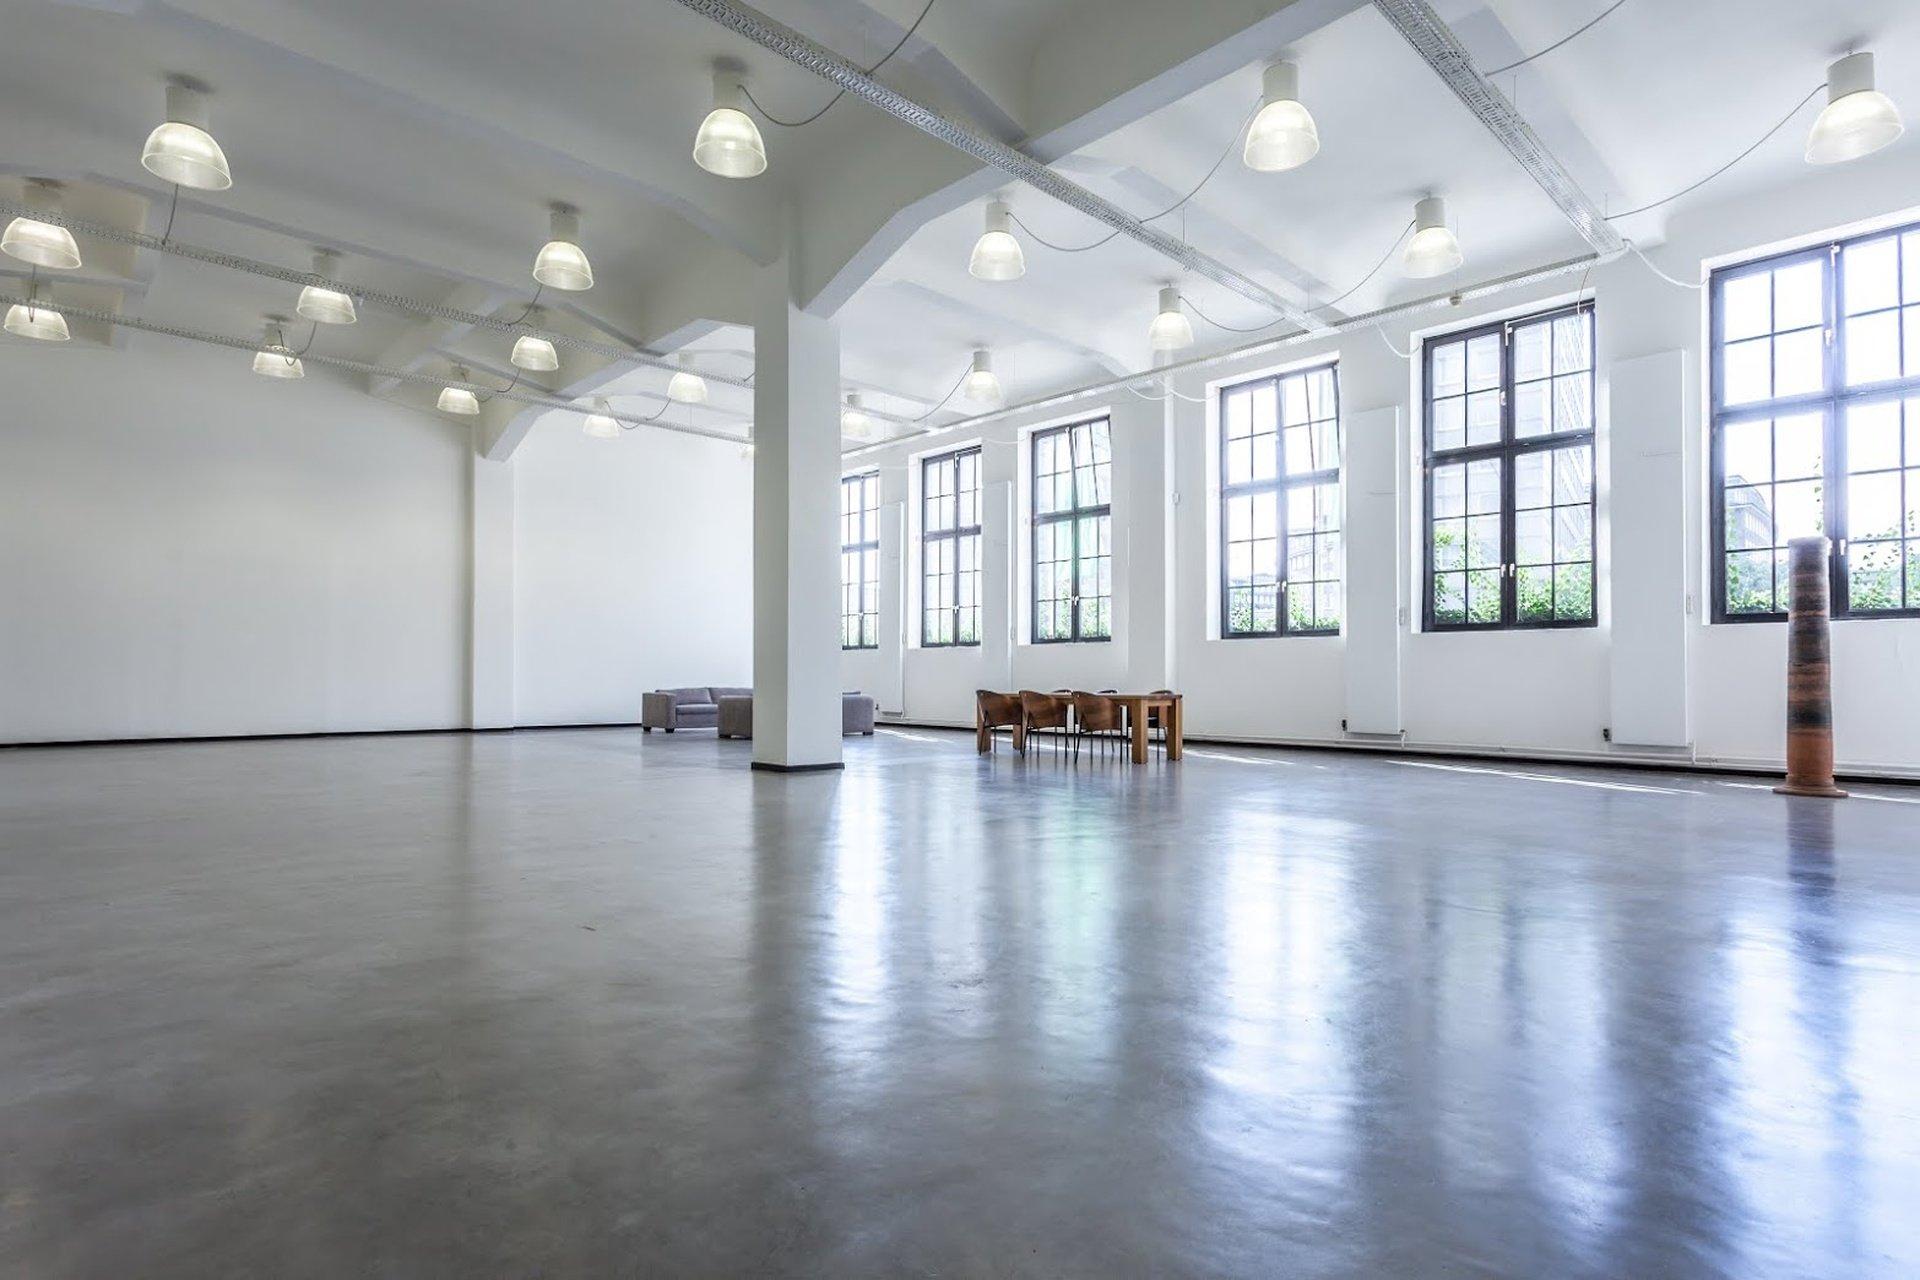 Hamburg corporate event venues Galerie d'art Barlach Halle K  image 0